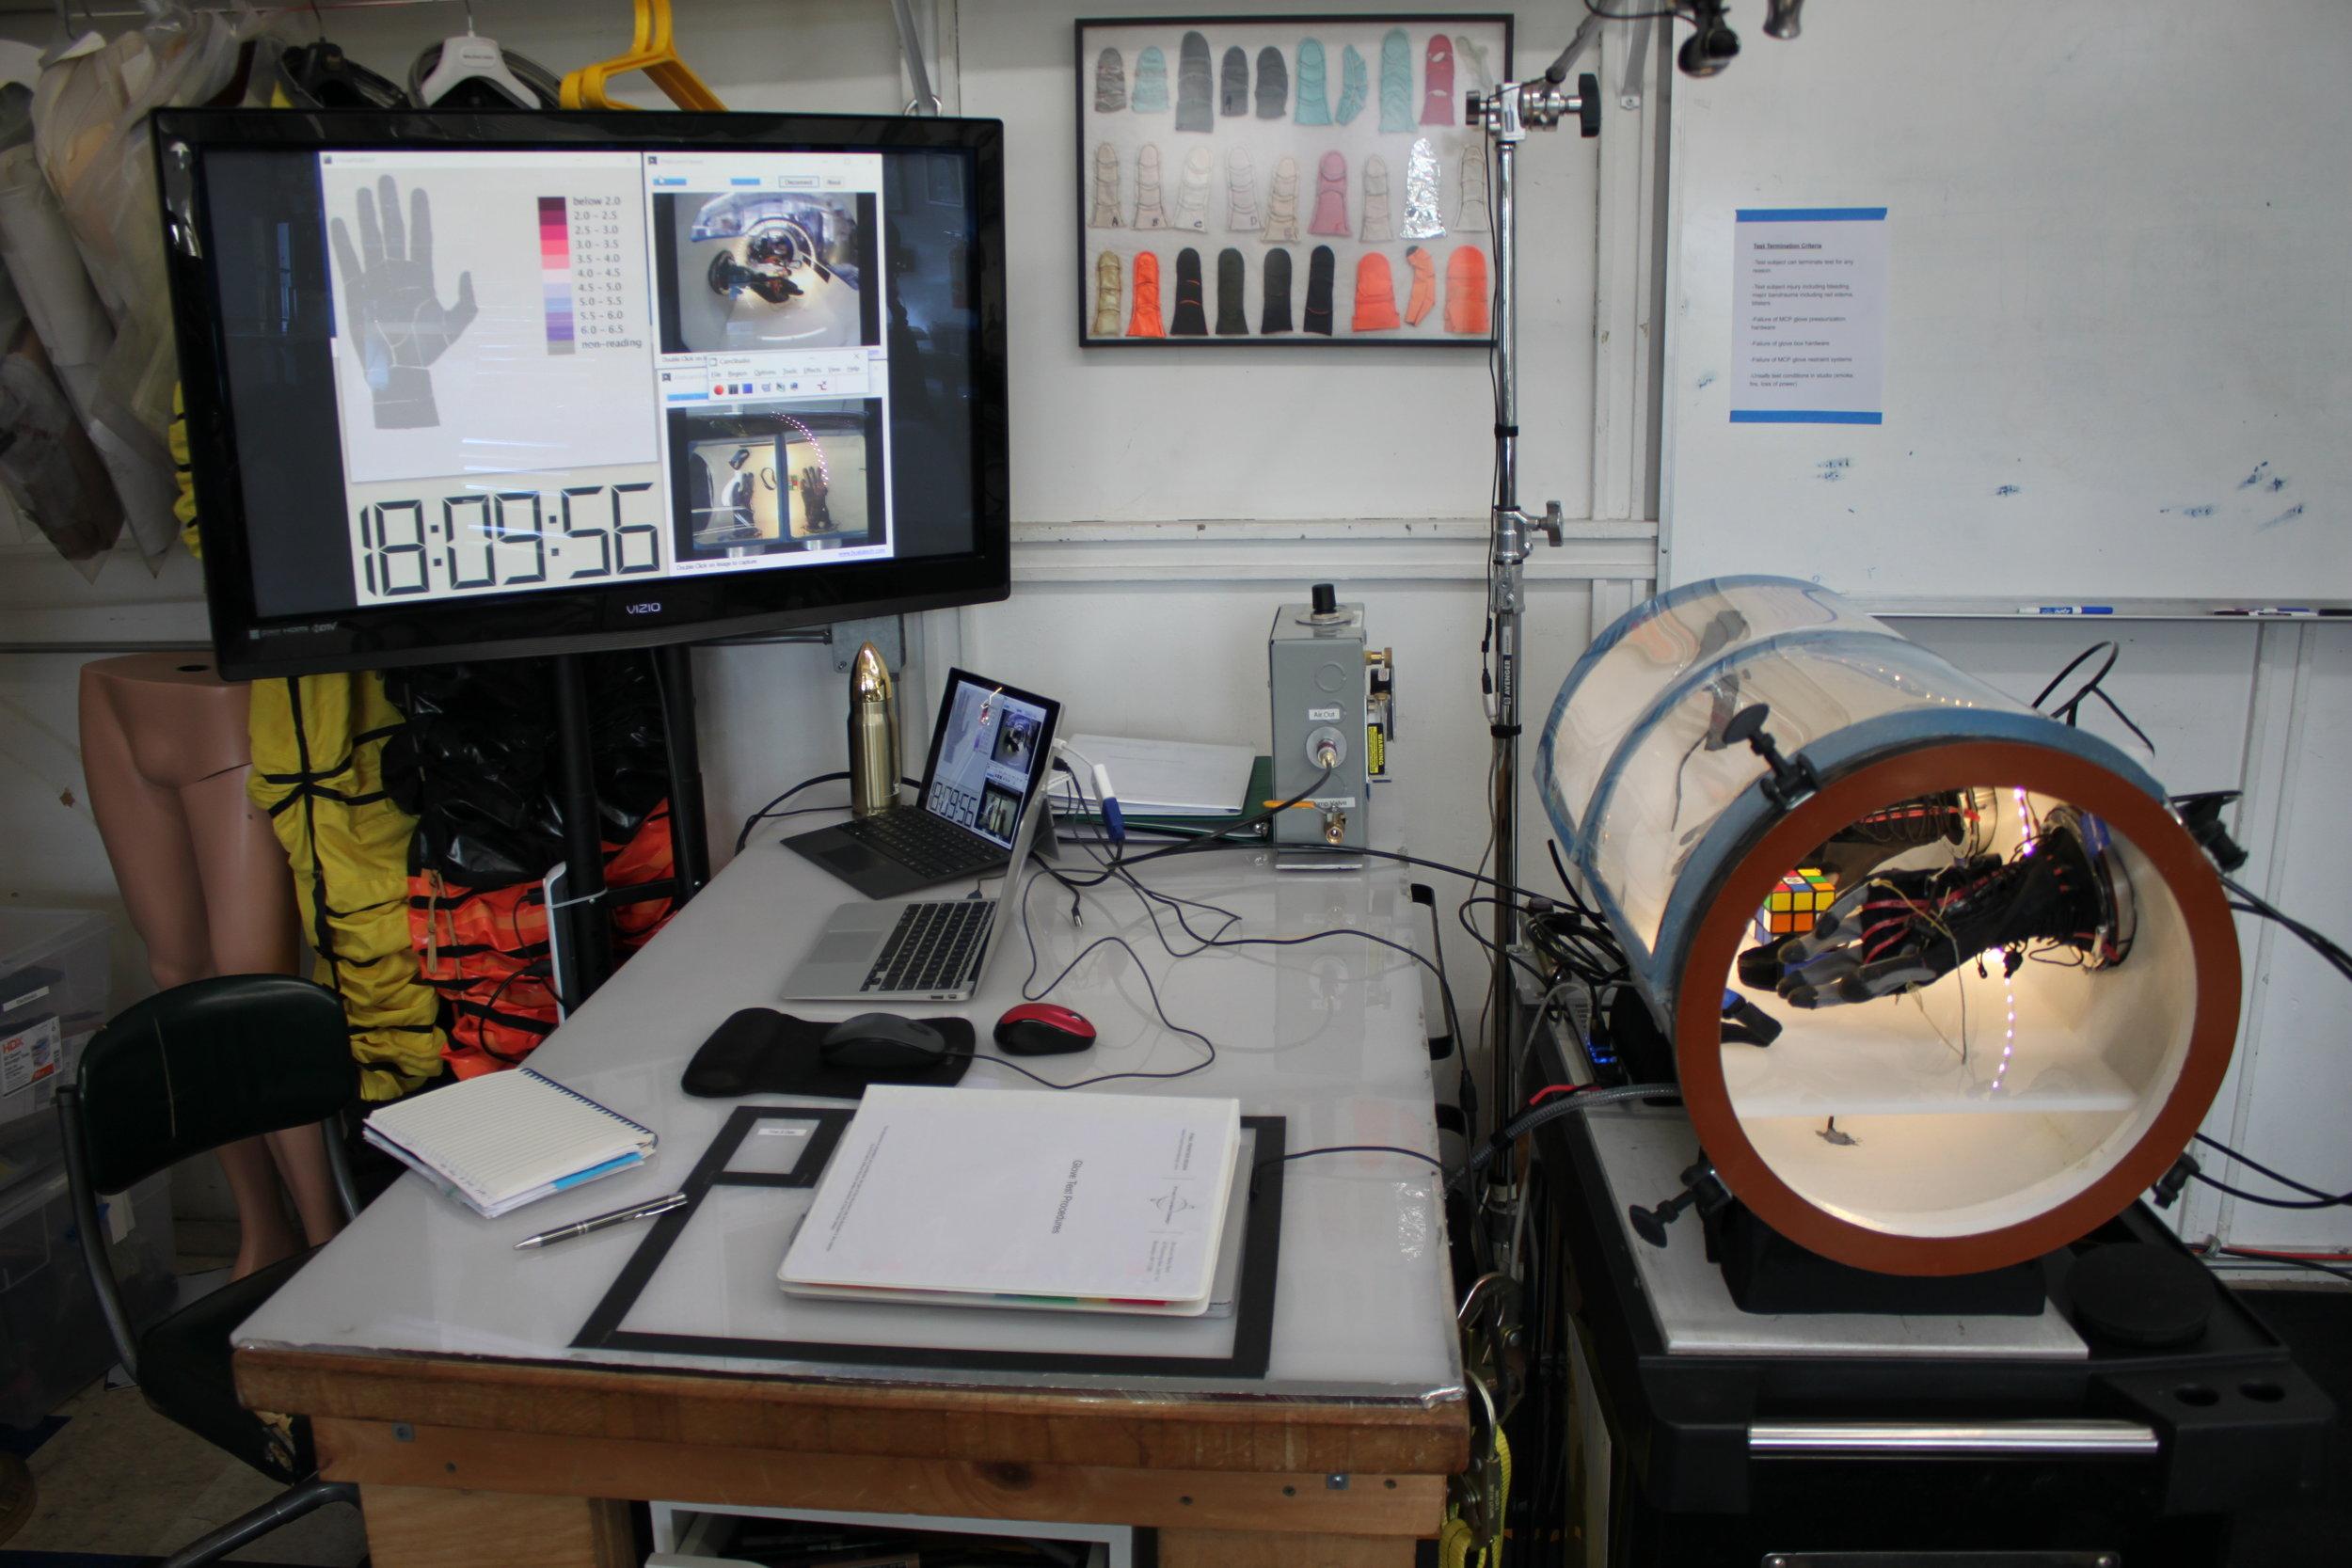 FFD MCP glove test evaluation setup including glove chamber, video documentation, and pressure visualization. (Credit: FFD)